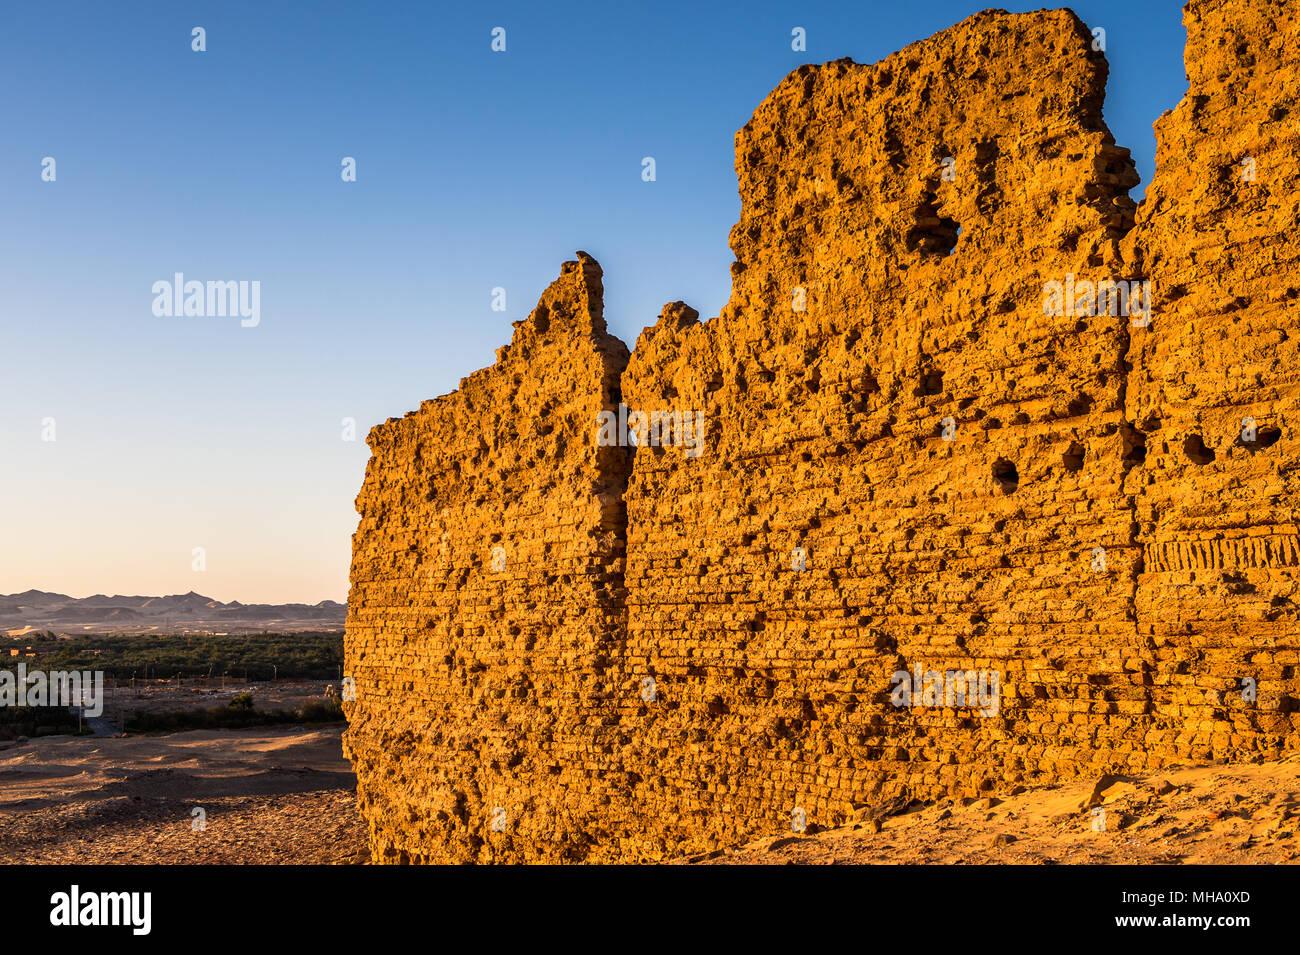 Ruins of the Nadora Temple in the Kharga Desert of Egypt Stock Photo